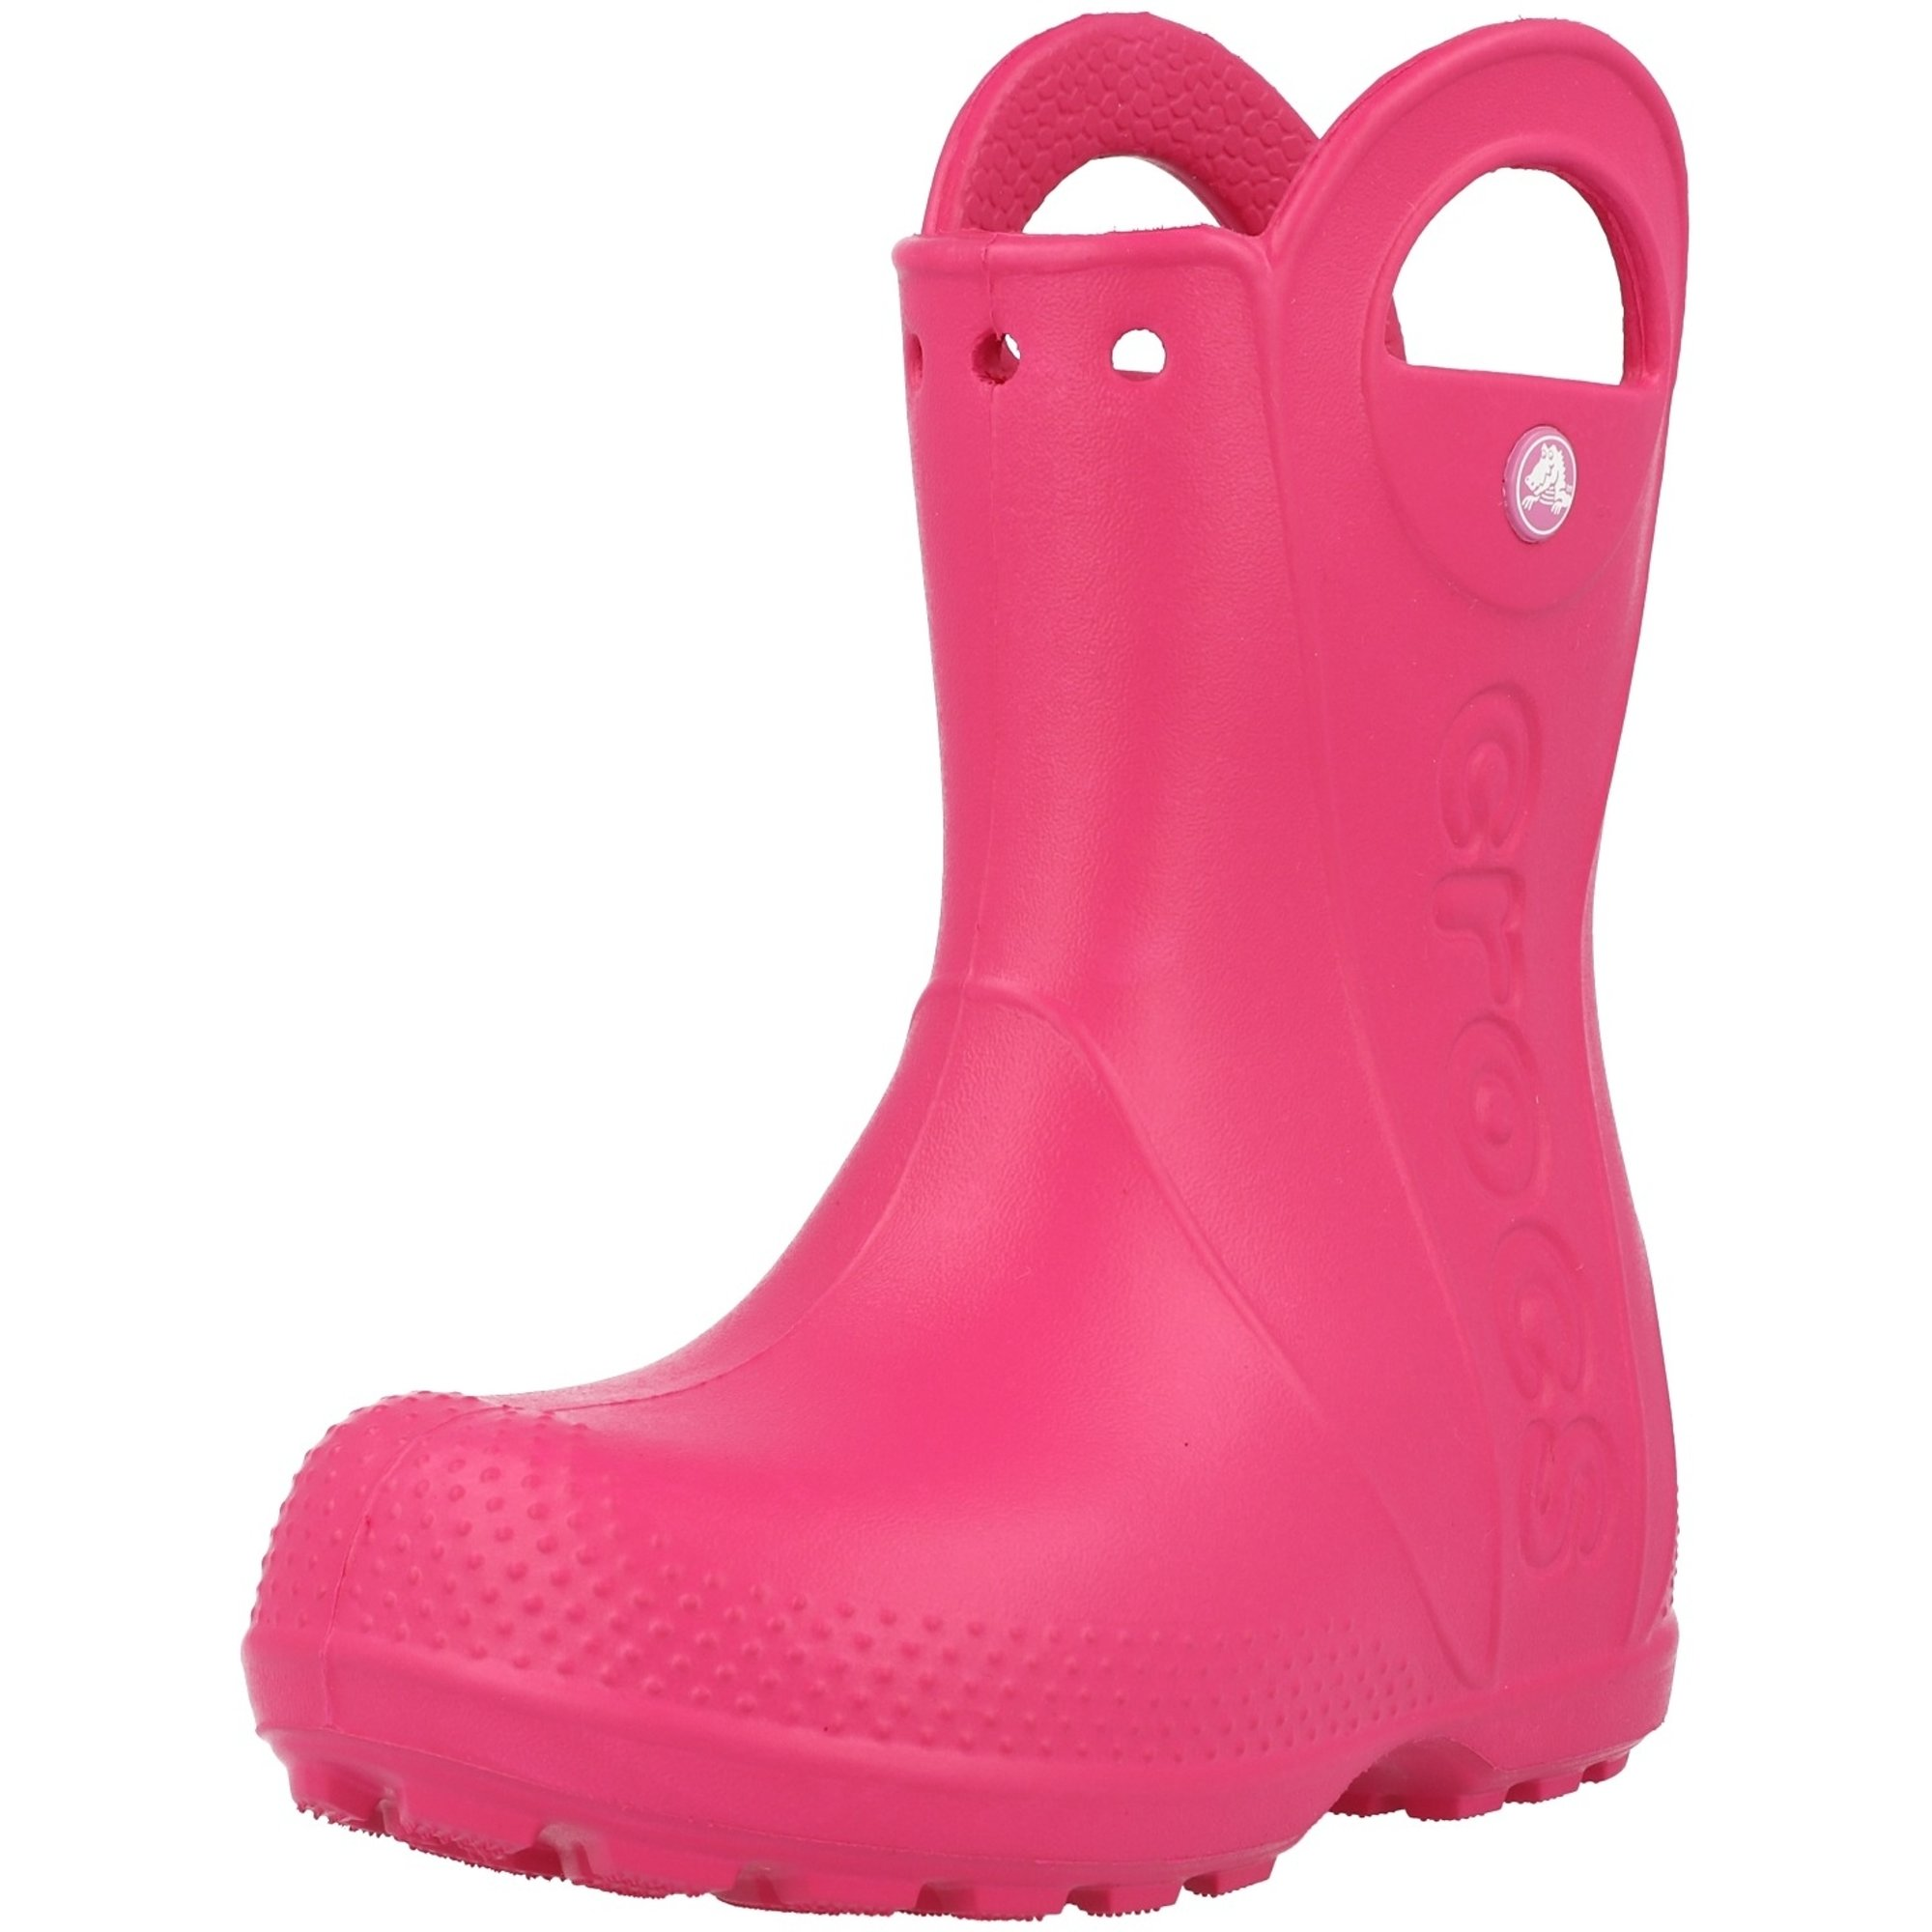 Crocs Kids Handle It Rain Boot Candy Pink Croslite Infant